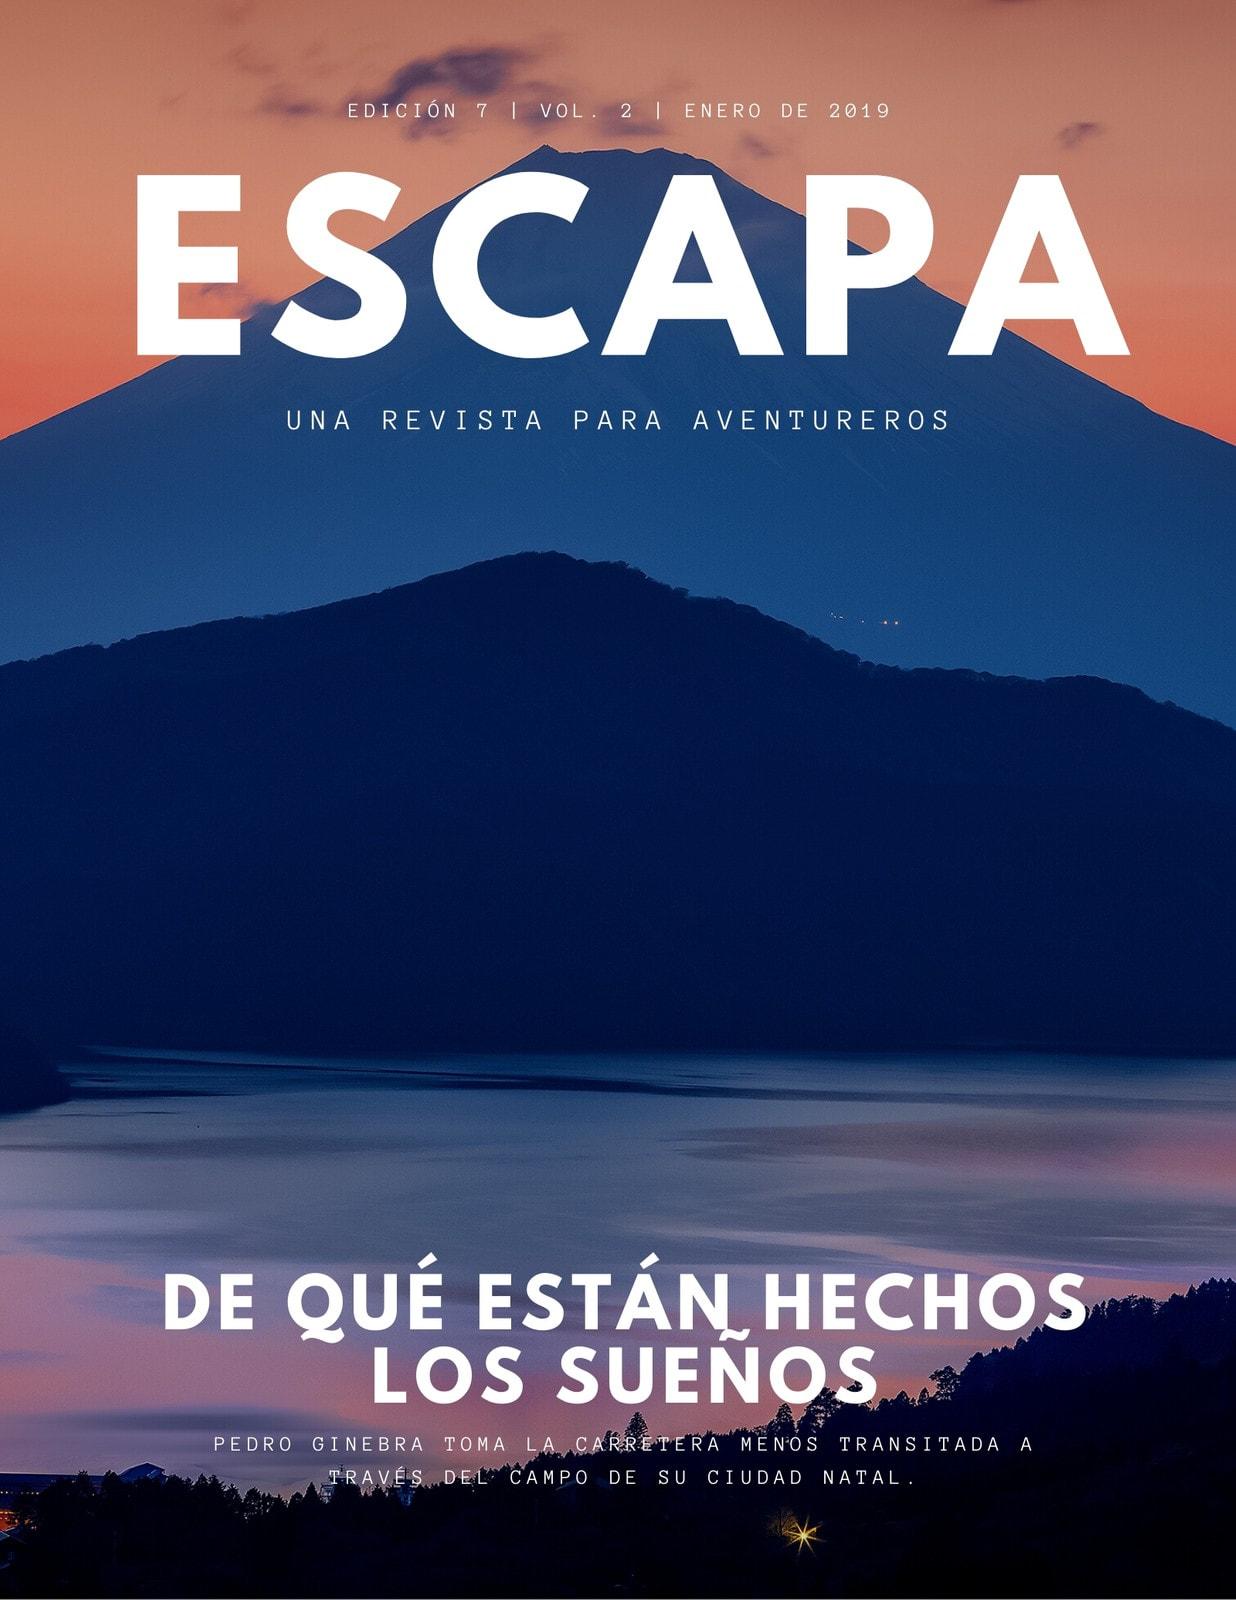 Revista de Viajes Montañas Sencillo Moderno